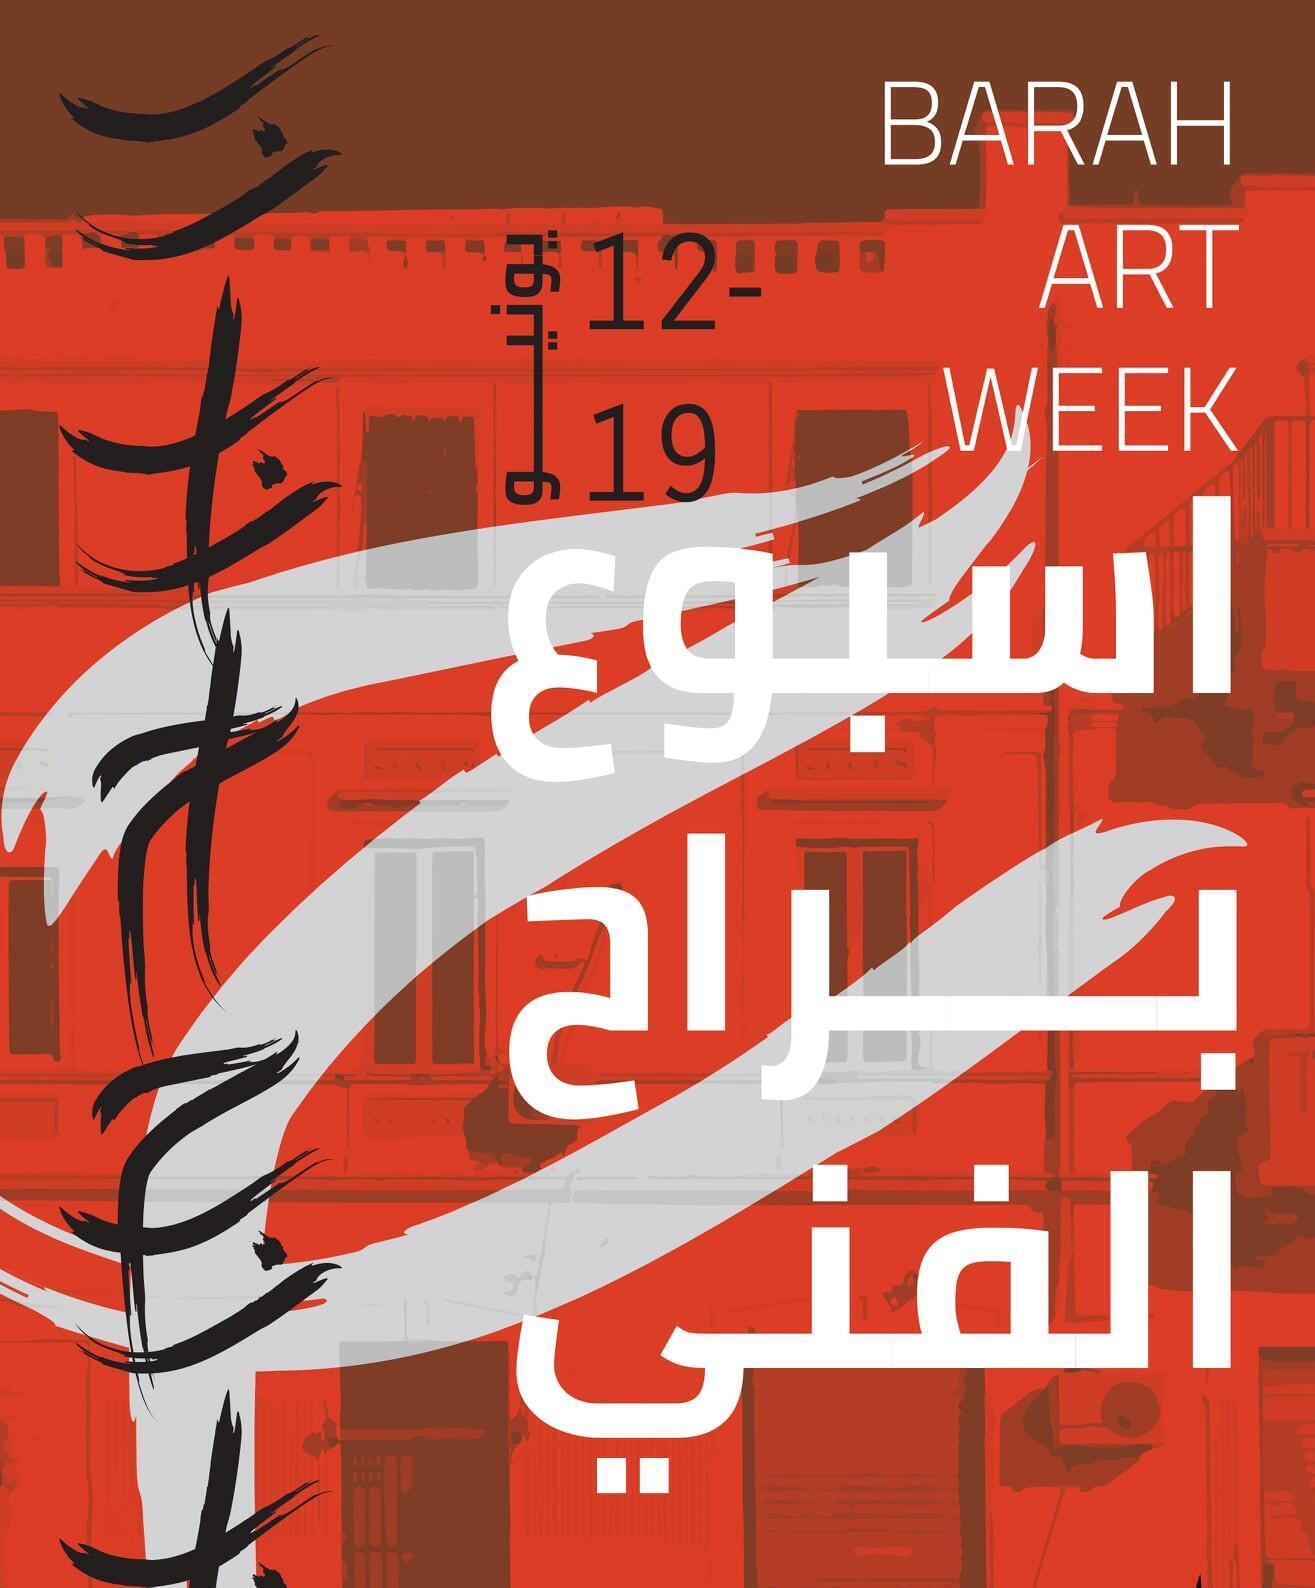 brah_art_week_libye